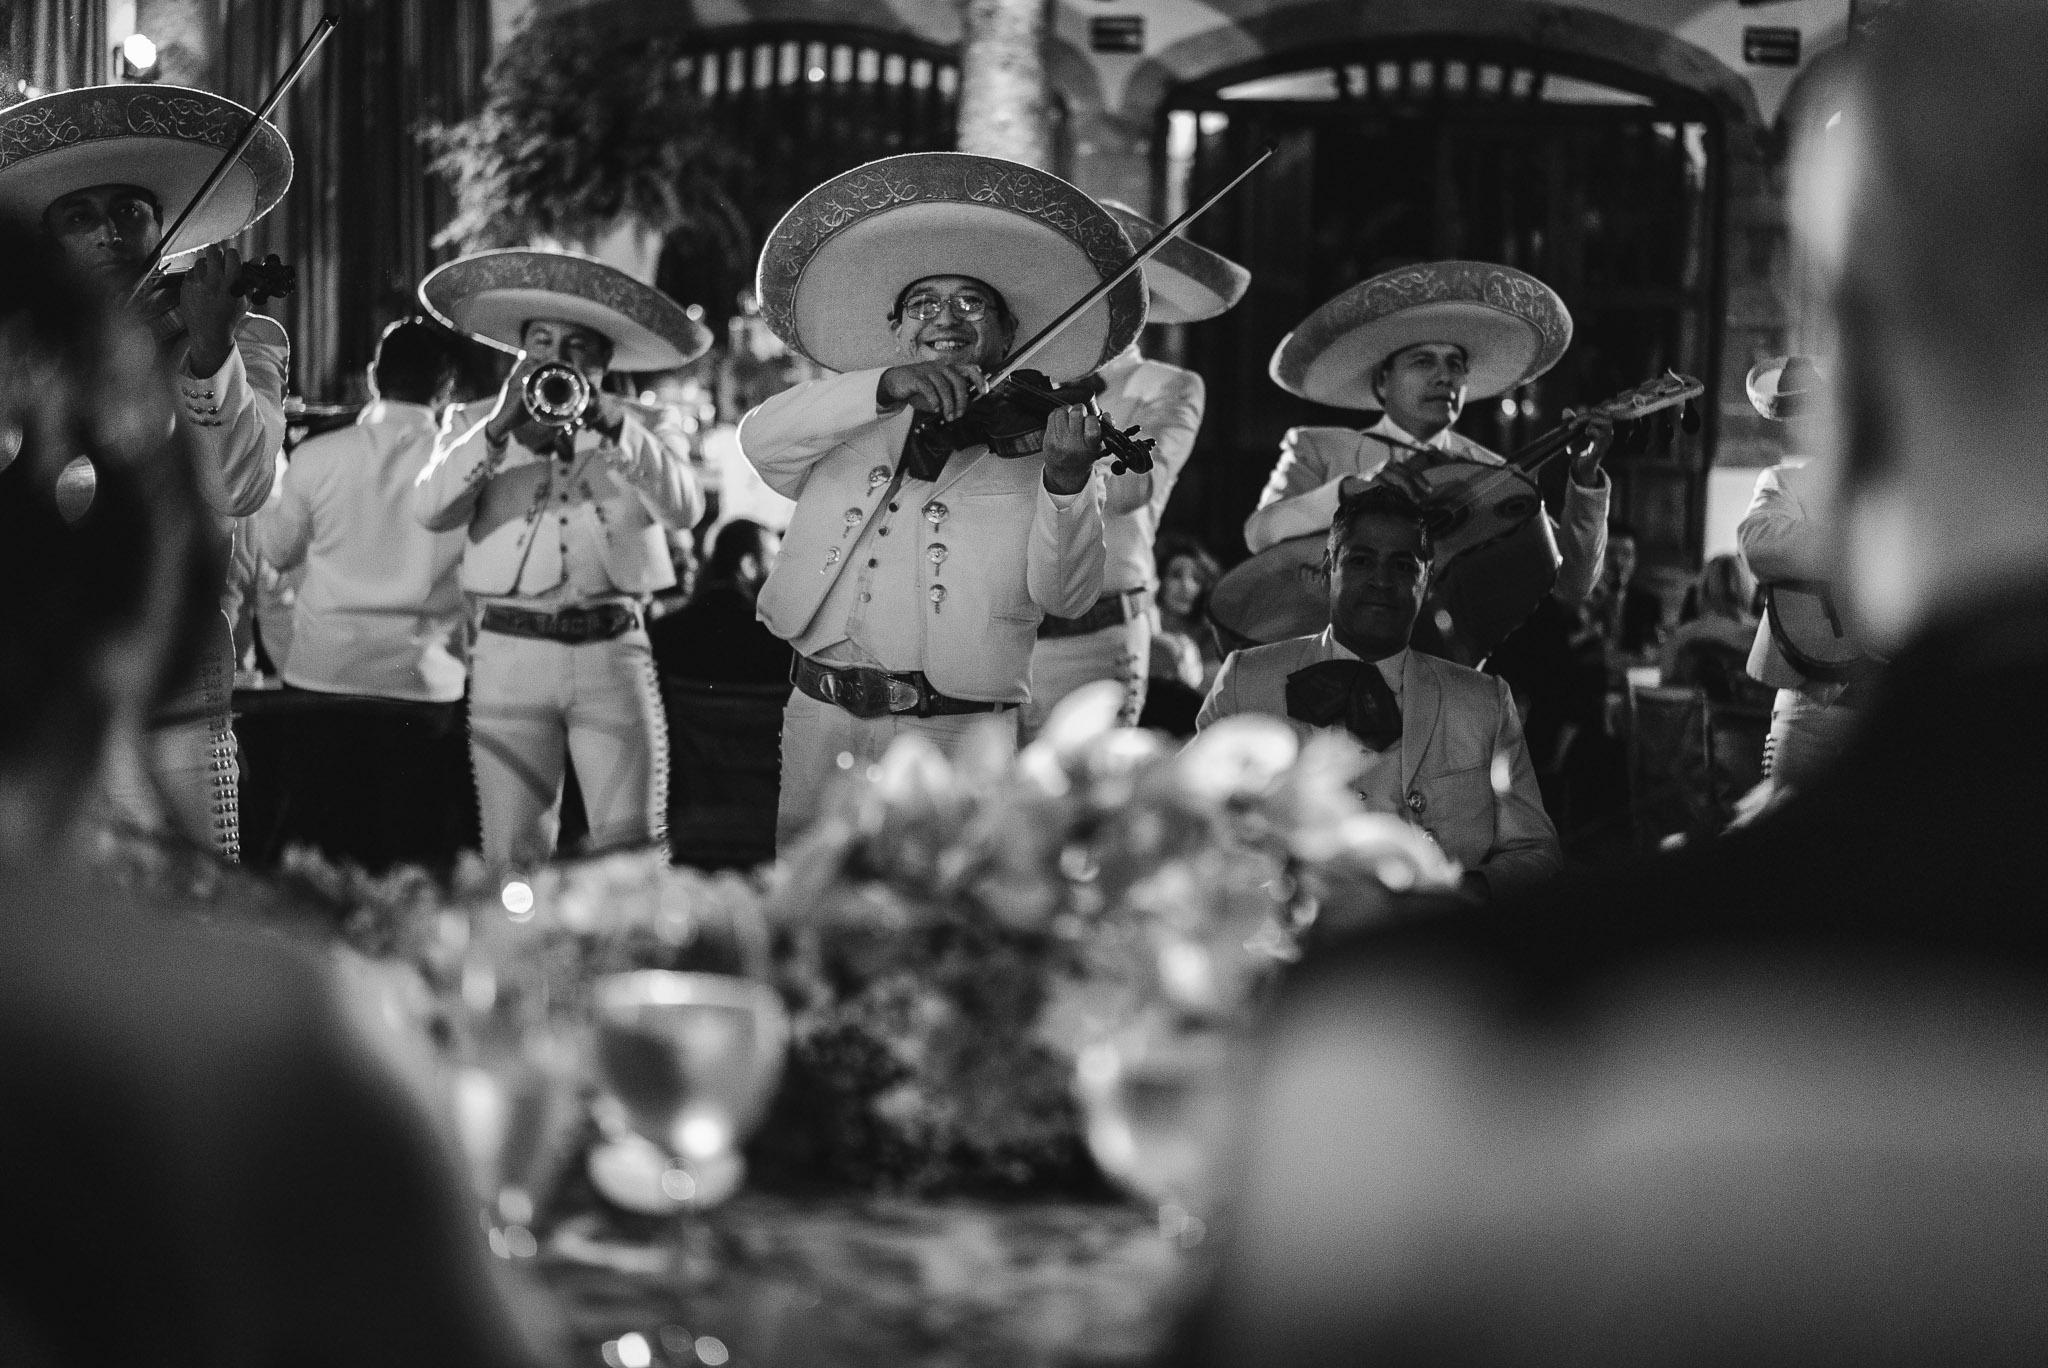 ©www.mauriziosolisbroca.com-20161001maurizio-solis-broca-mexico-canada-wedding-photographer20161001DSC08169-Edit.jpg